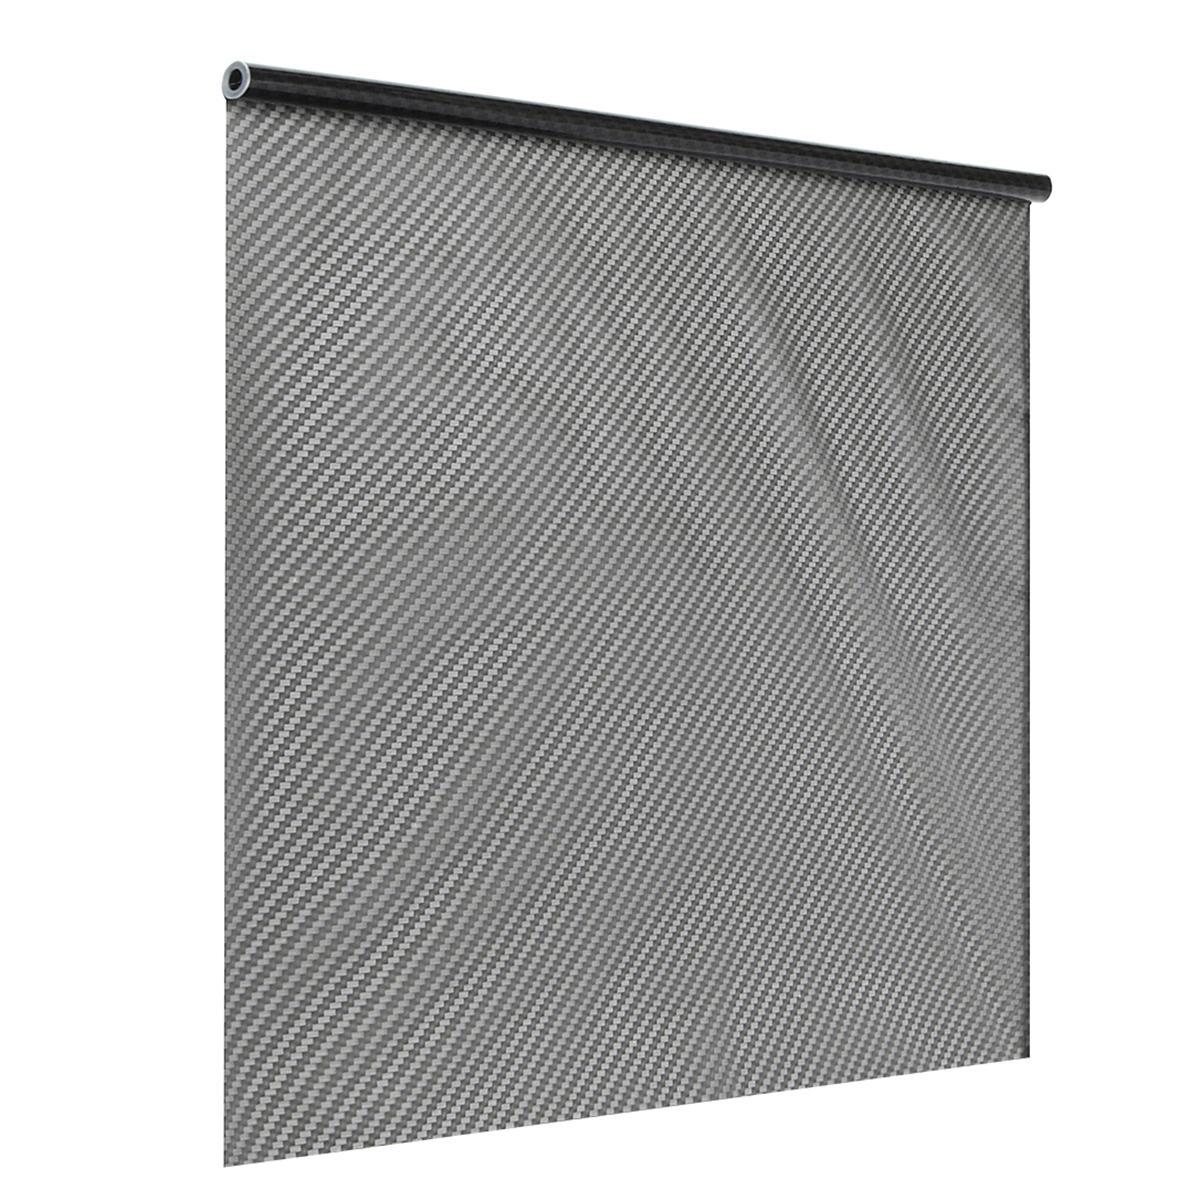 Water Transfer Printing Film Hydrographic Film Hydro Dip Carbon Fiber COD